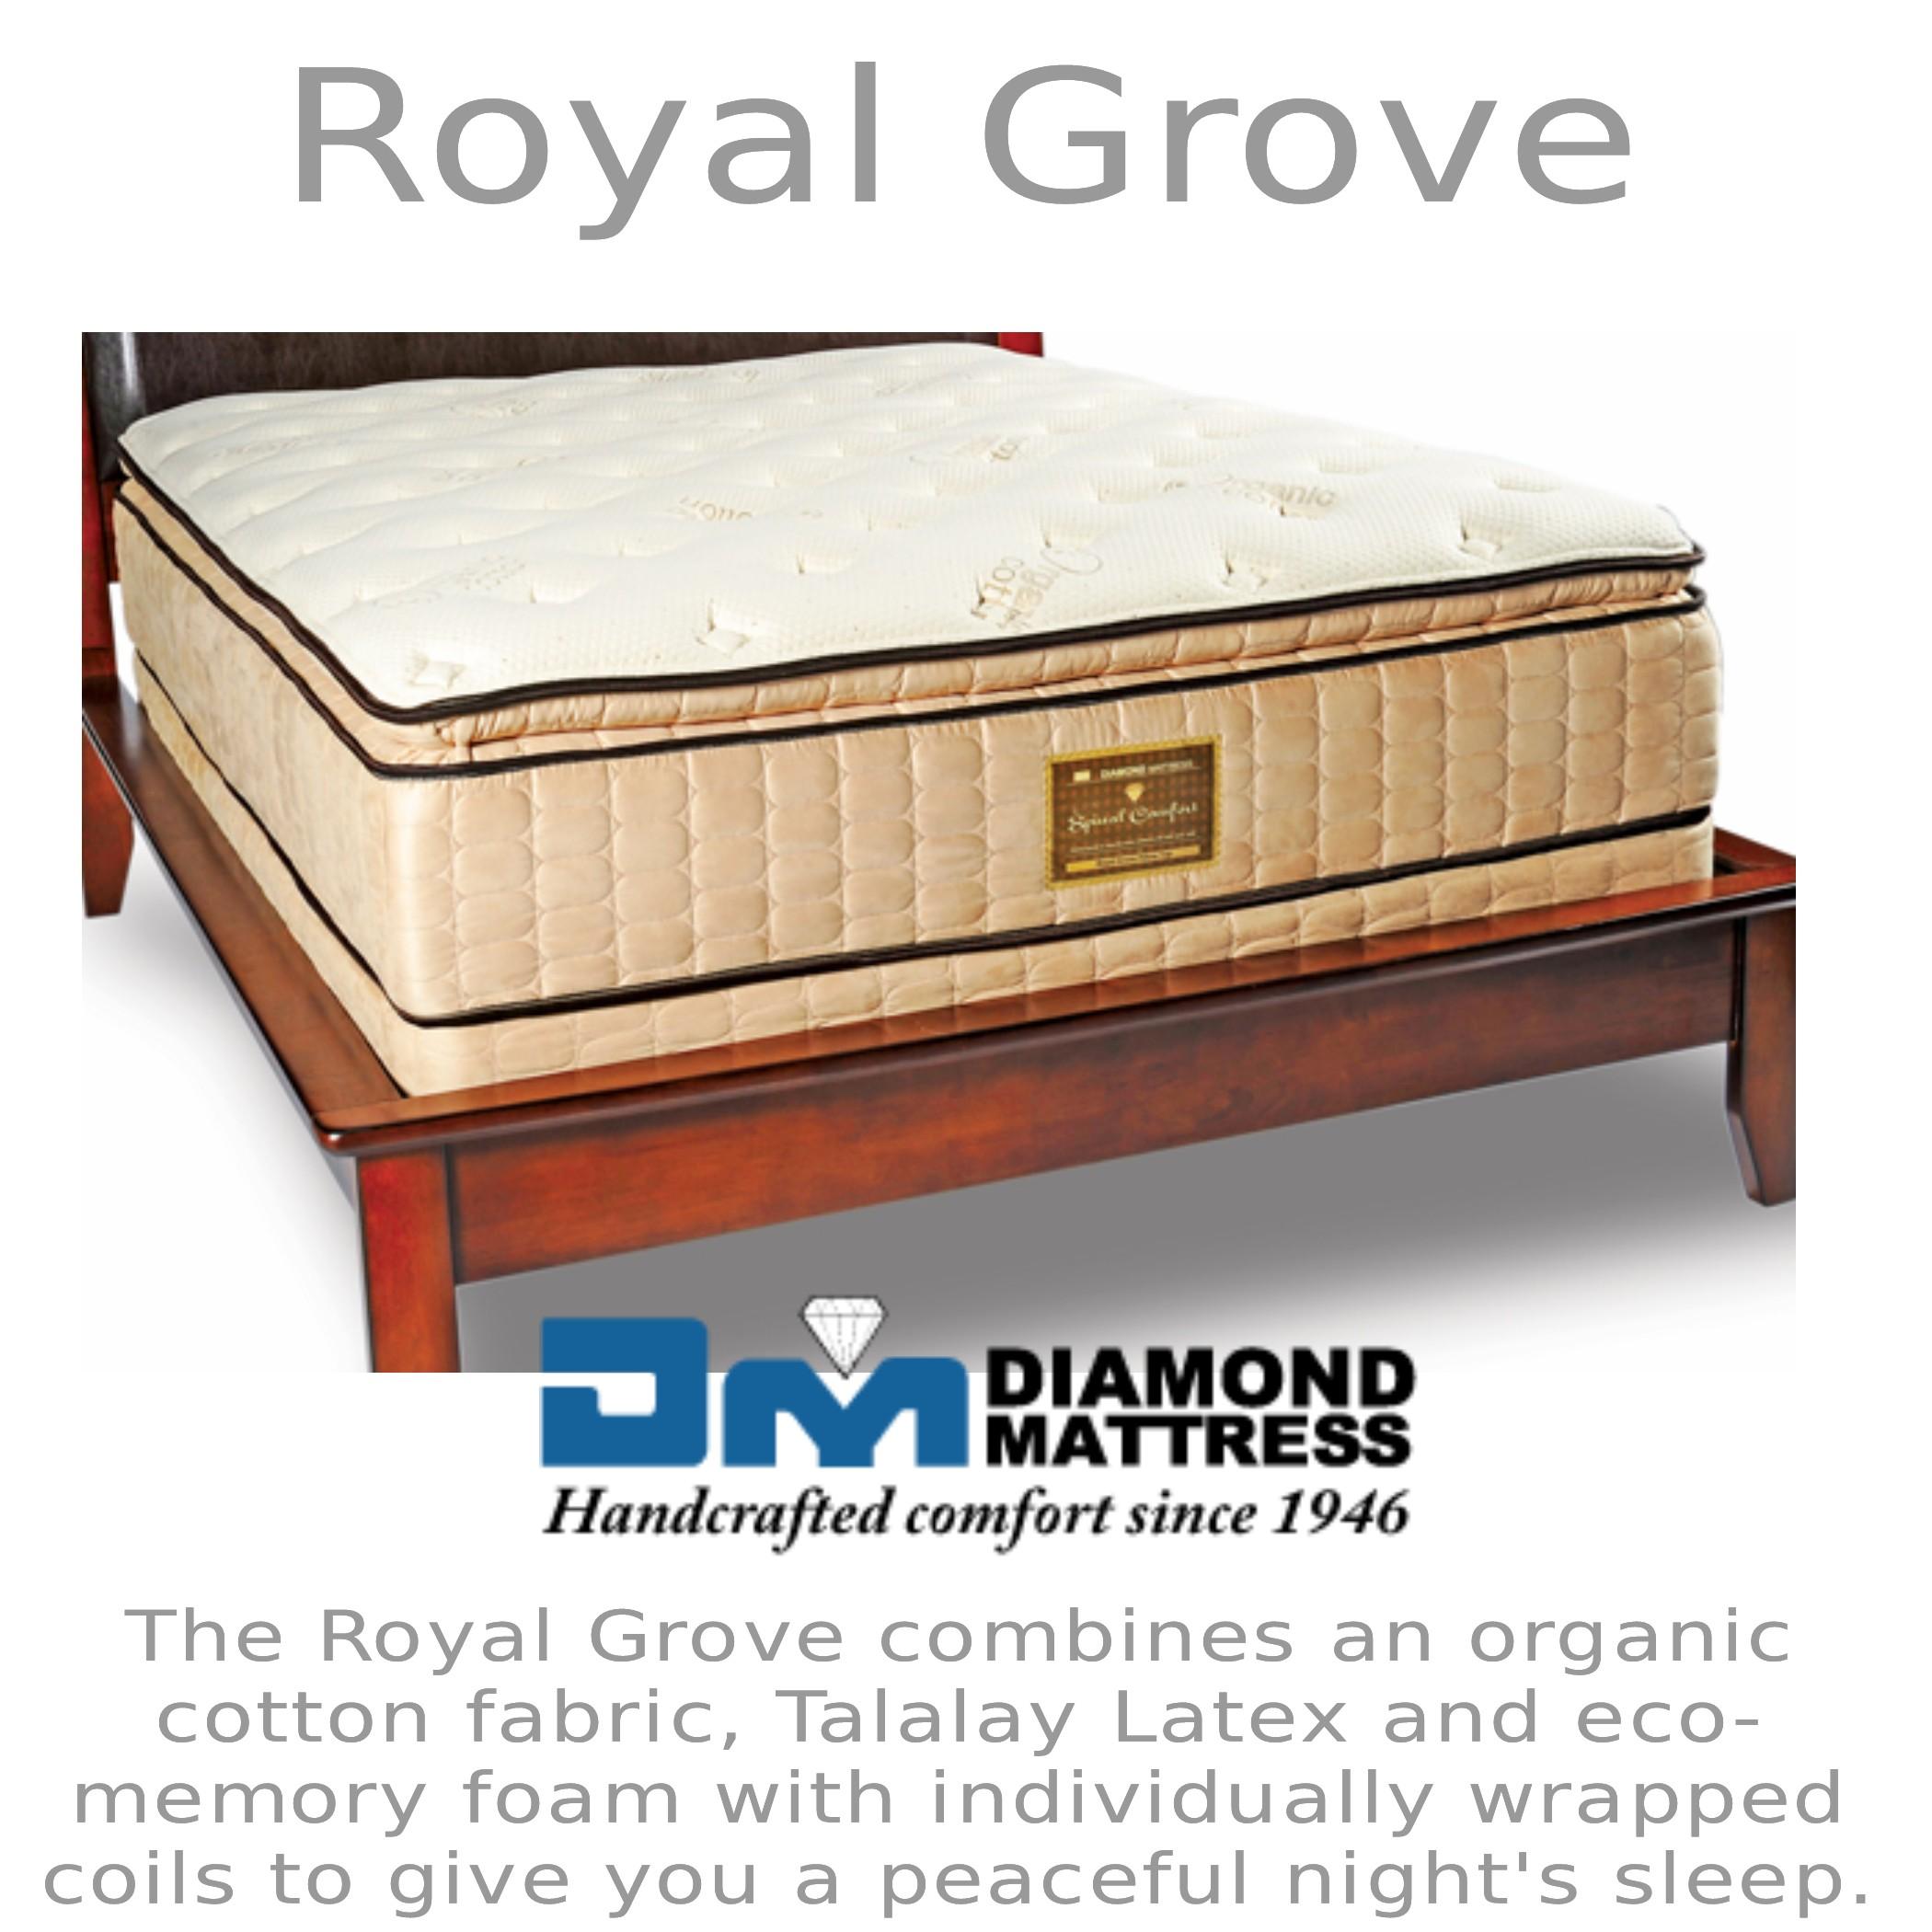 Royal Grove.jpg